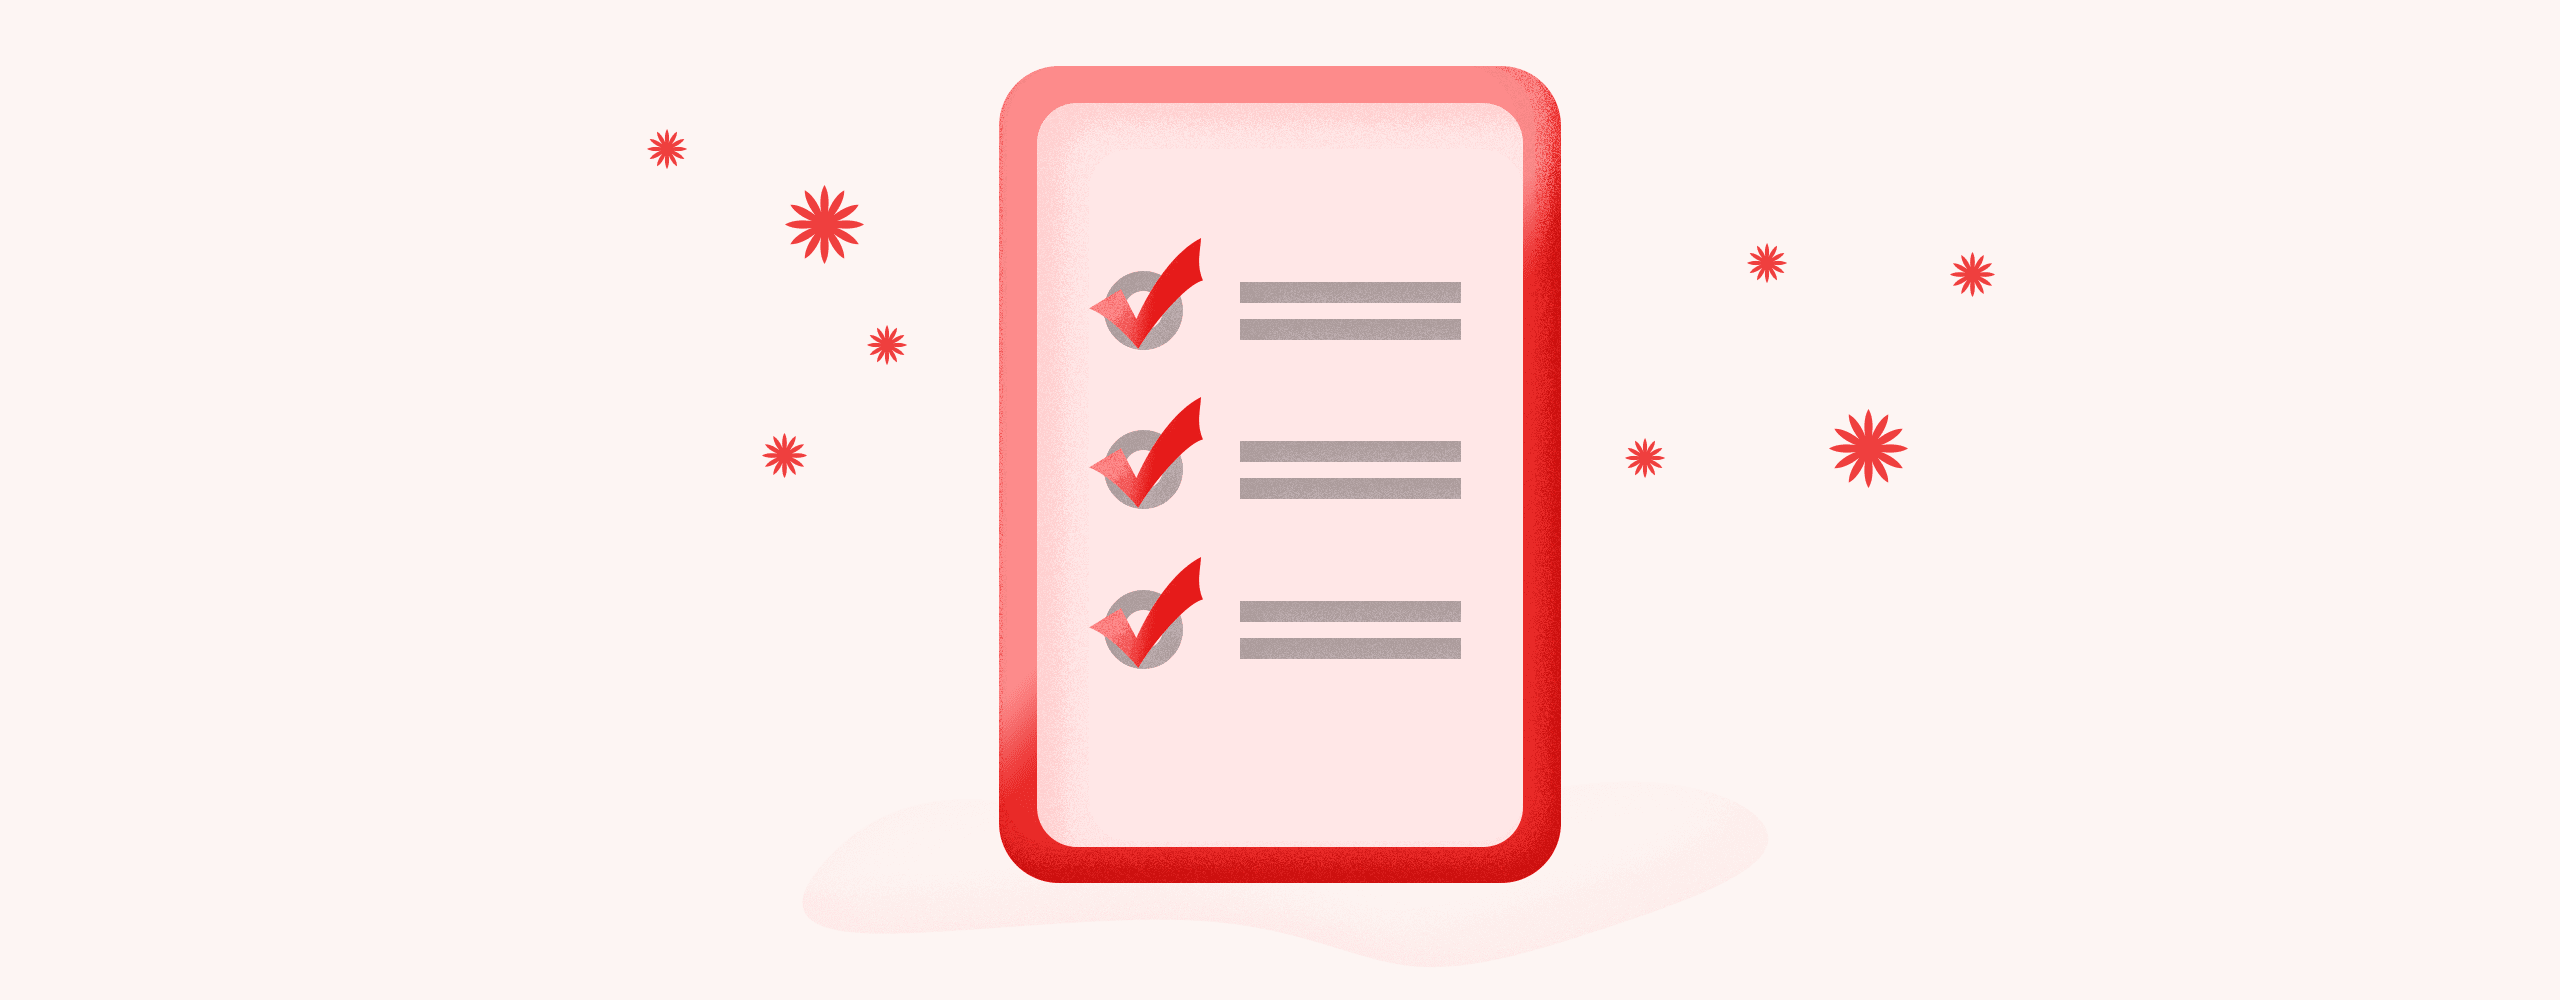 good-practices-in-HR-apps-design